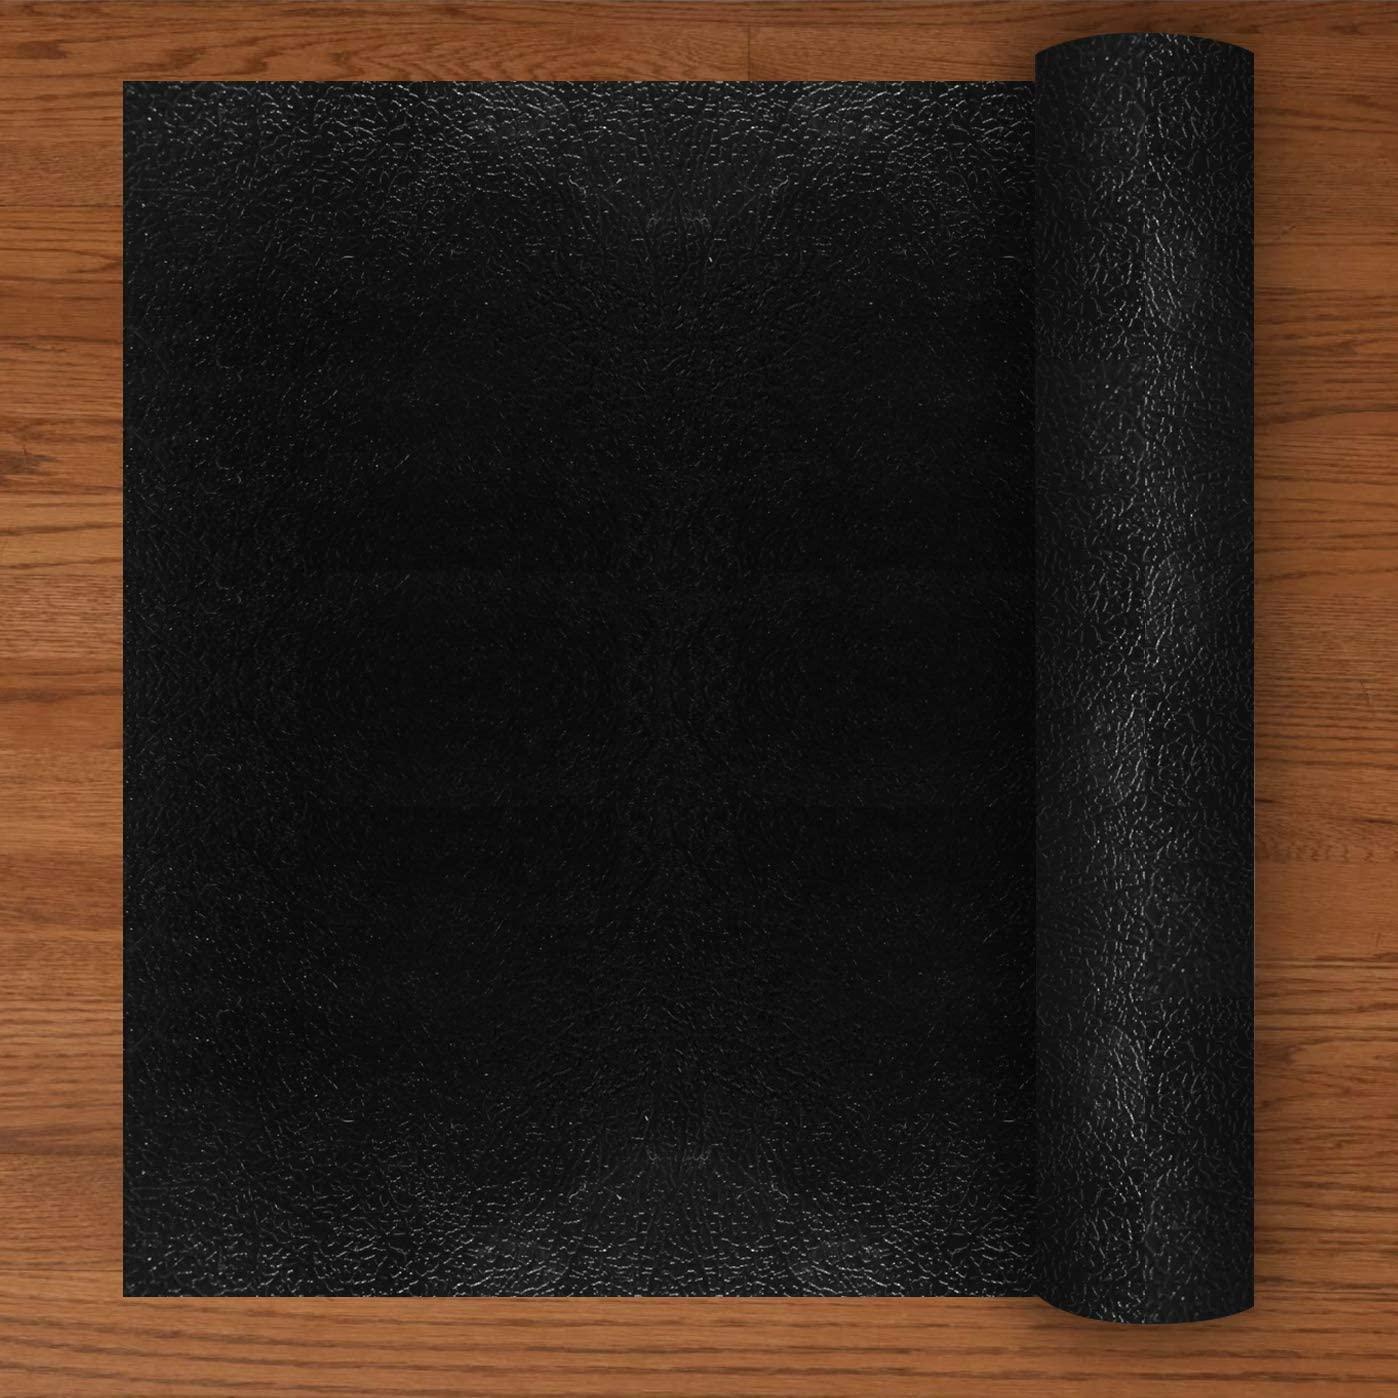 Resilia - Deluxe Black Vinyl, Plastic Floor Runner/Protector for Hardwood Floors - Non-Skid, Textured Pattern, (27 Inches Wide x 12 Feet Long)